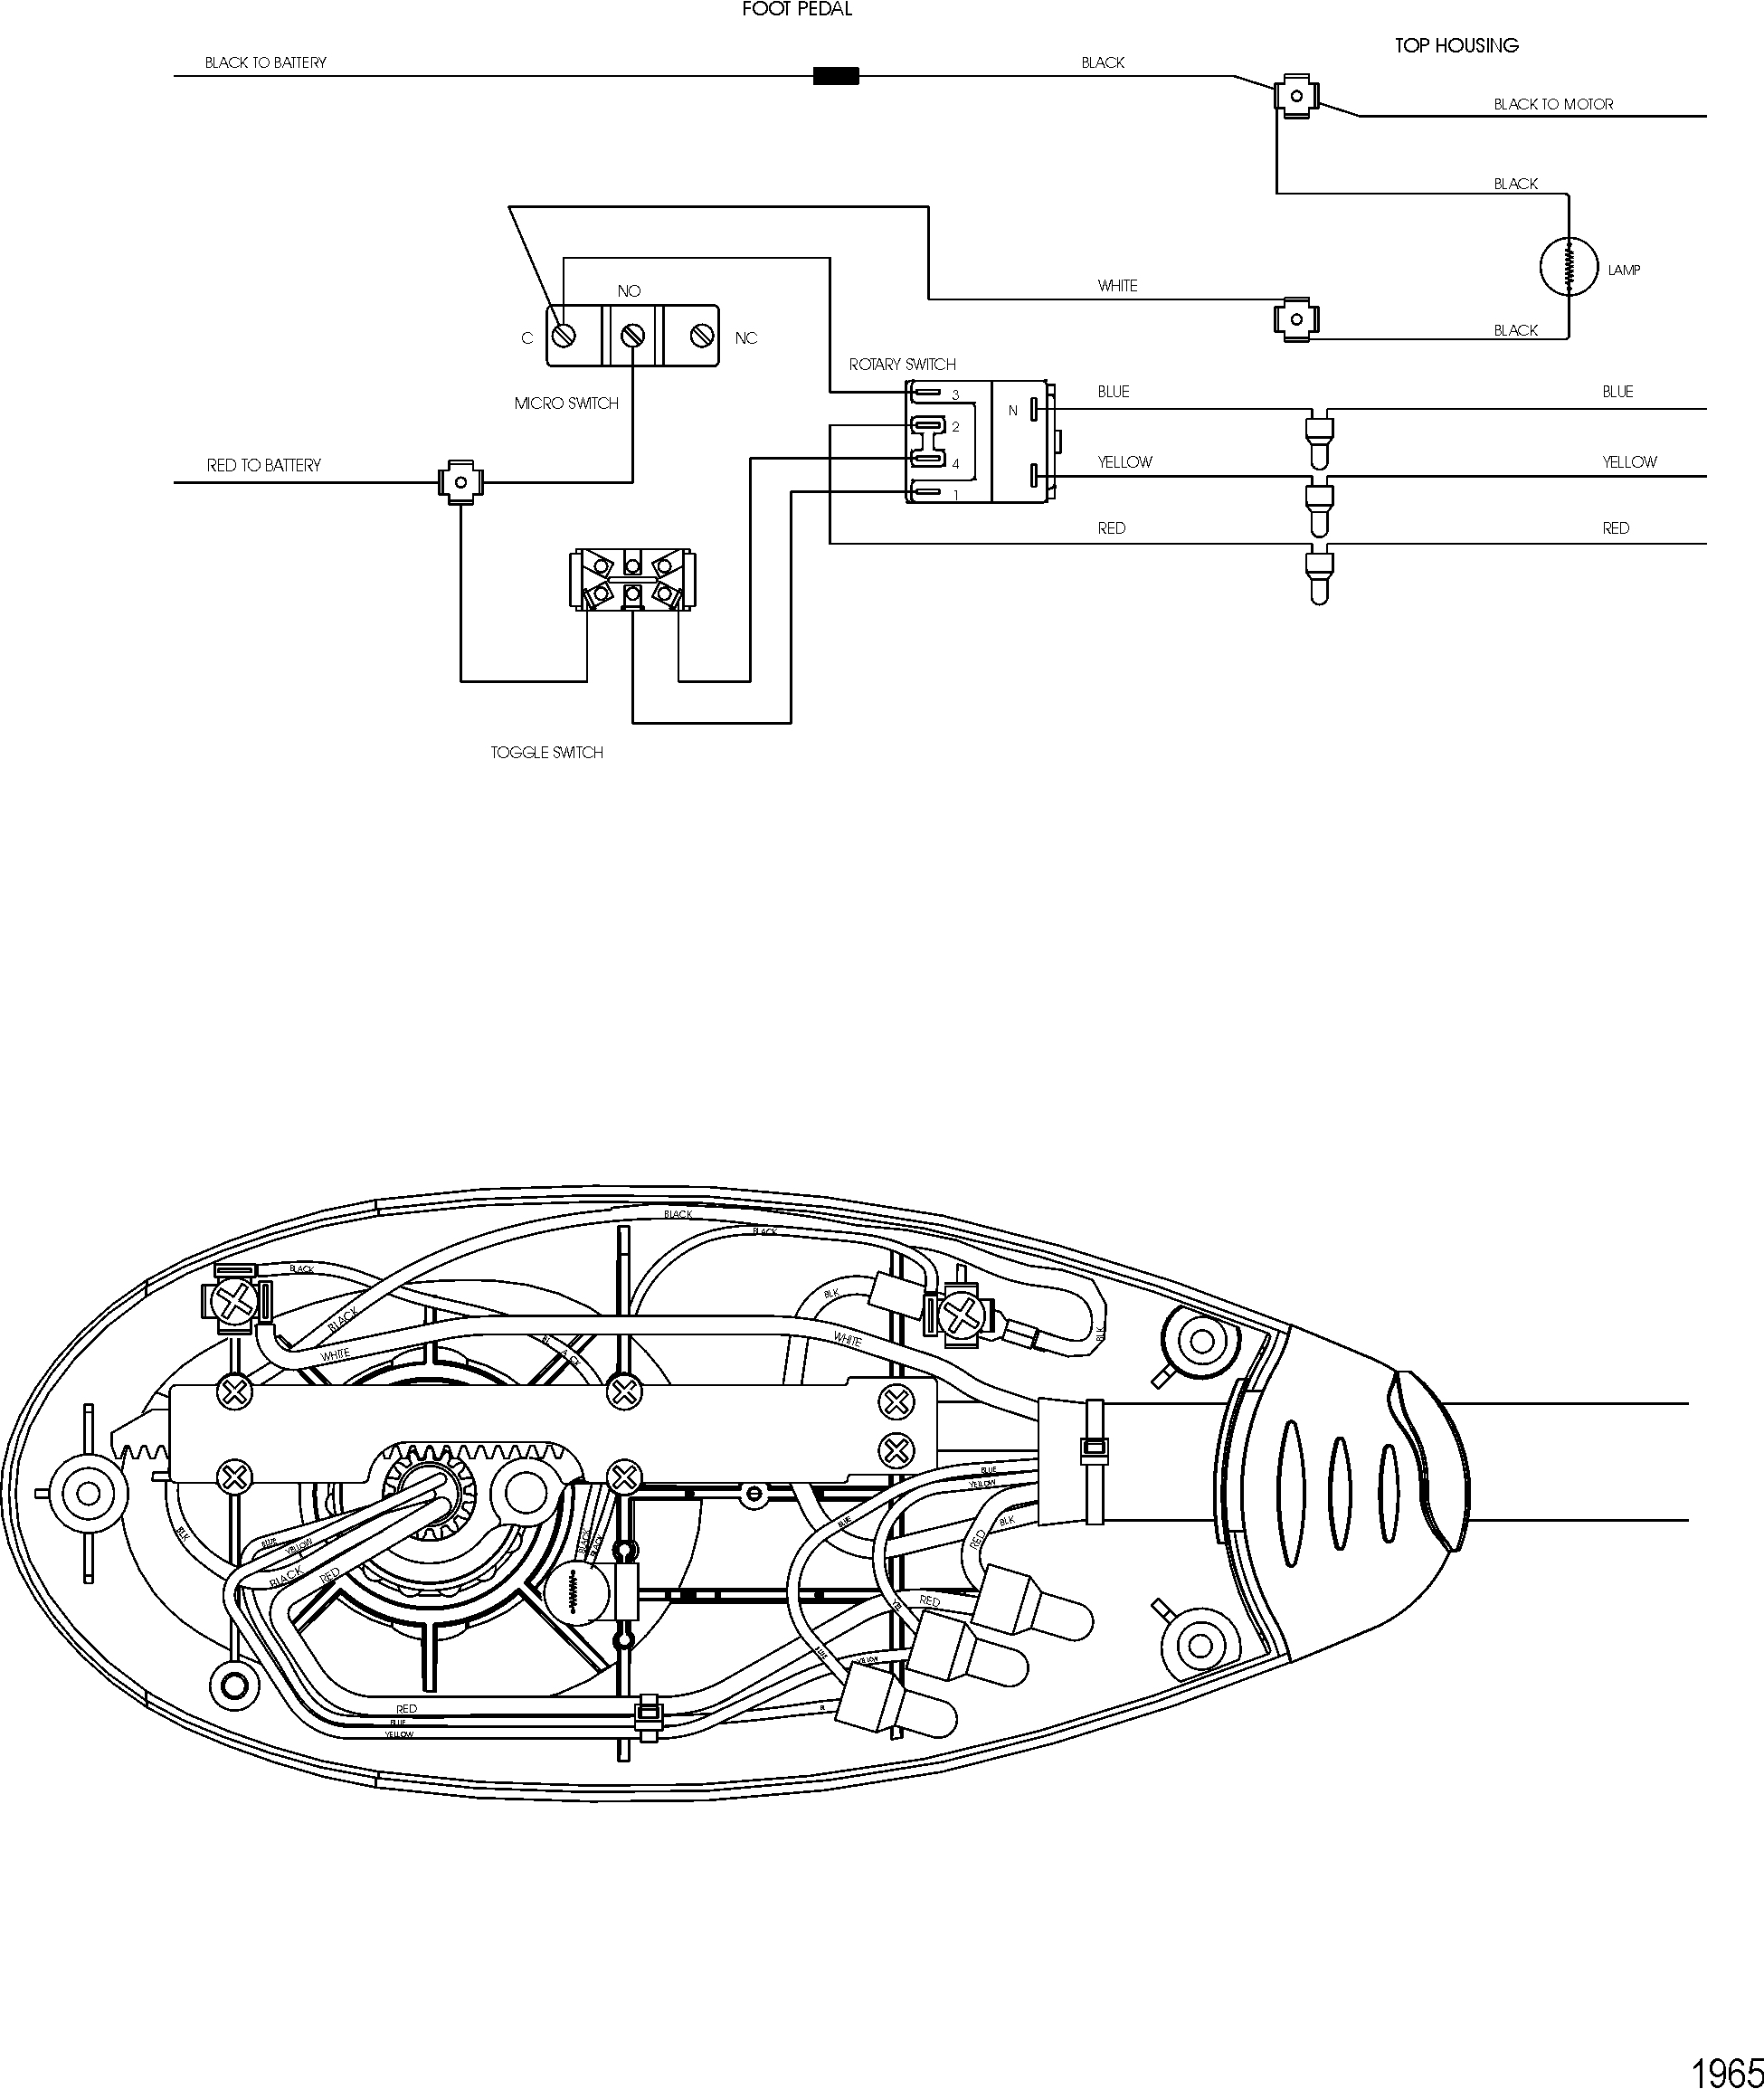 Mercury Trolling Motor Motorguide Fresh Water Series 9b000001 Rigid Wiring Diagram Up Wire Diagrammodel Fw46fb